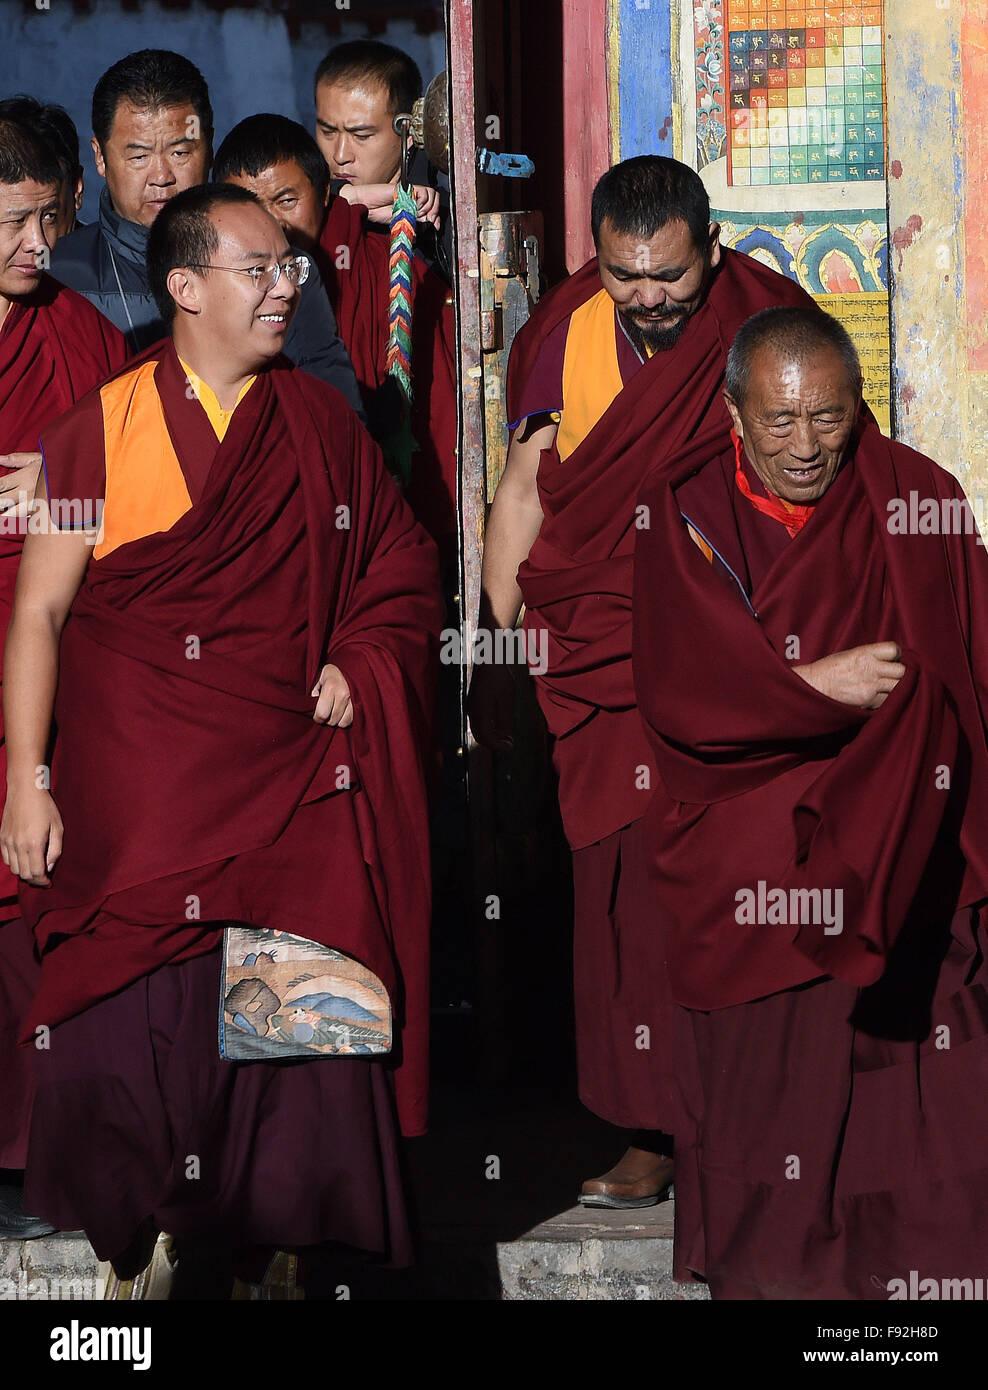 Xigaze, China's Tibet Autonomous Region. 13th Dec, 2015. Bainqen Erdini Qoigyijabu (front L), the 11th Panchen - Stock Image